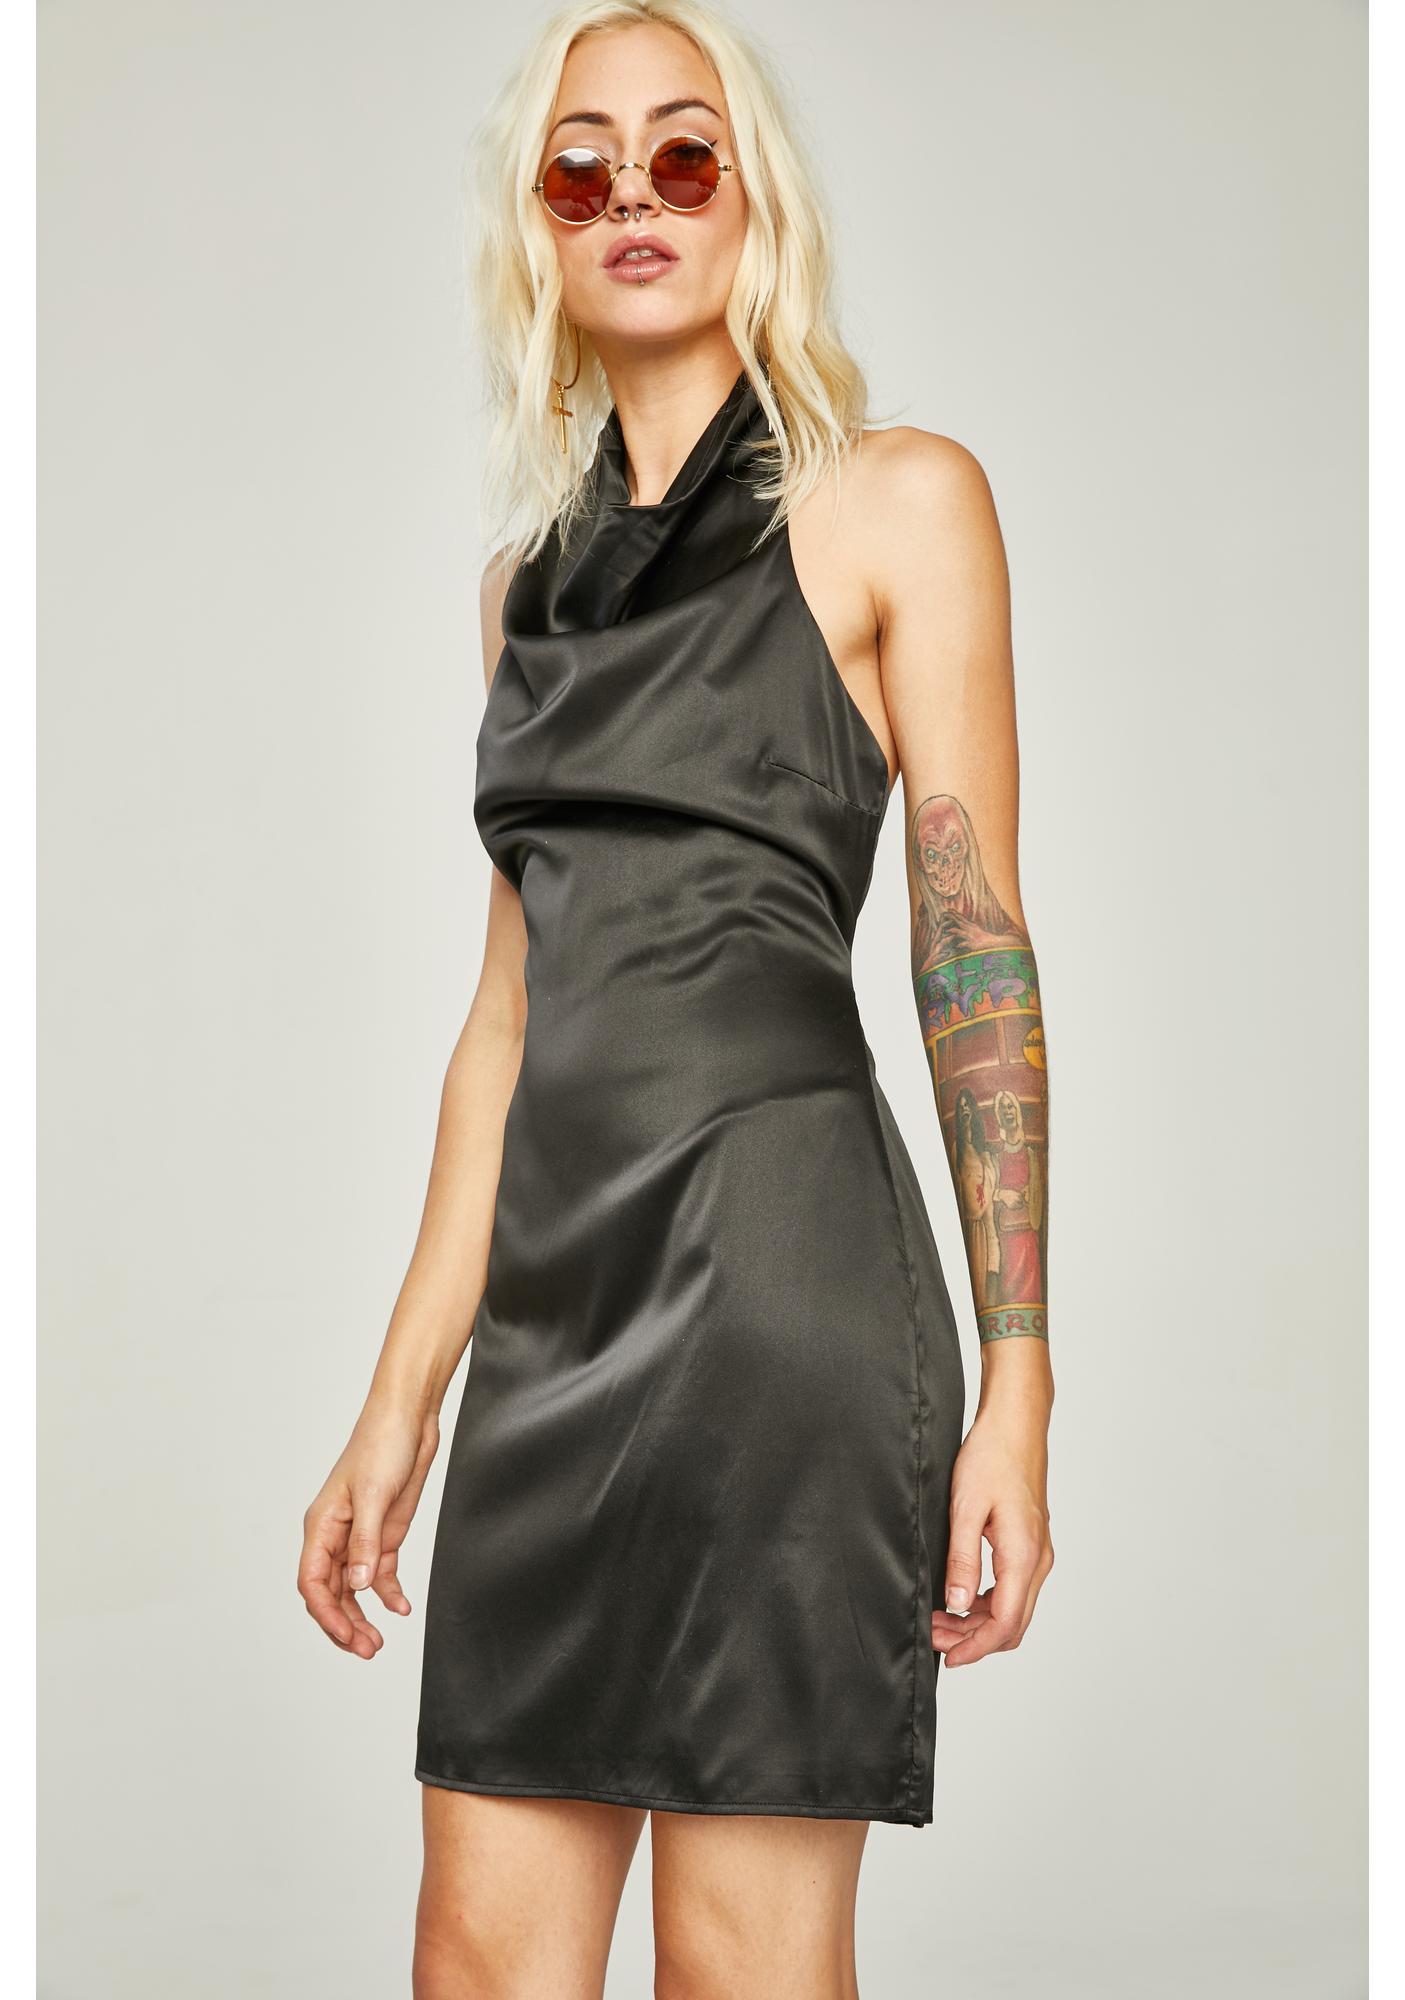 Oh So Fancy Halter Dress